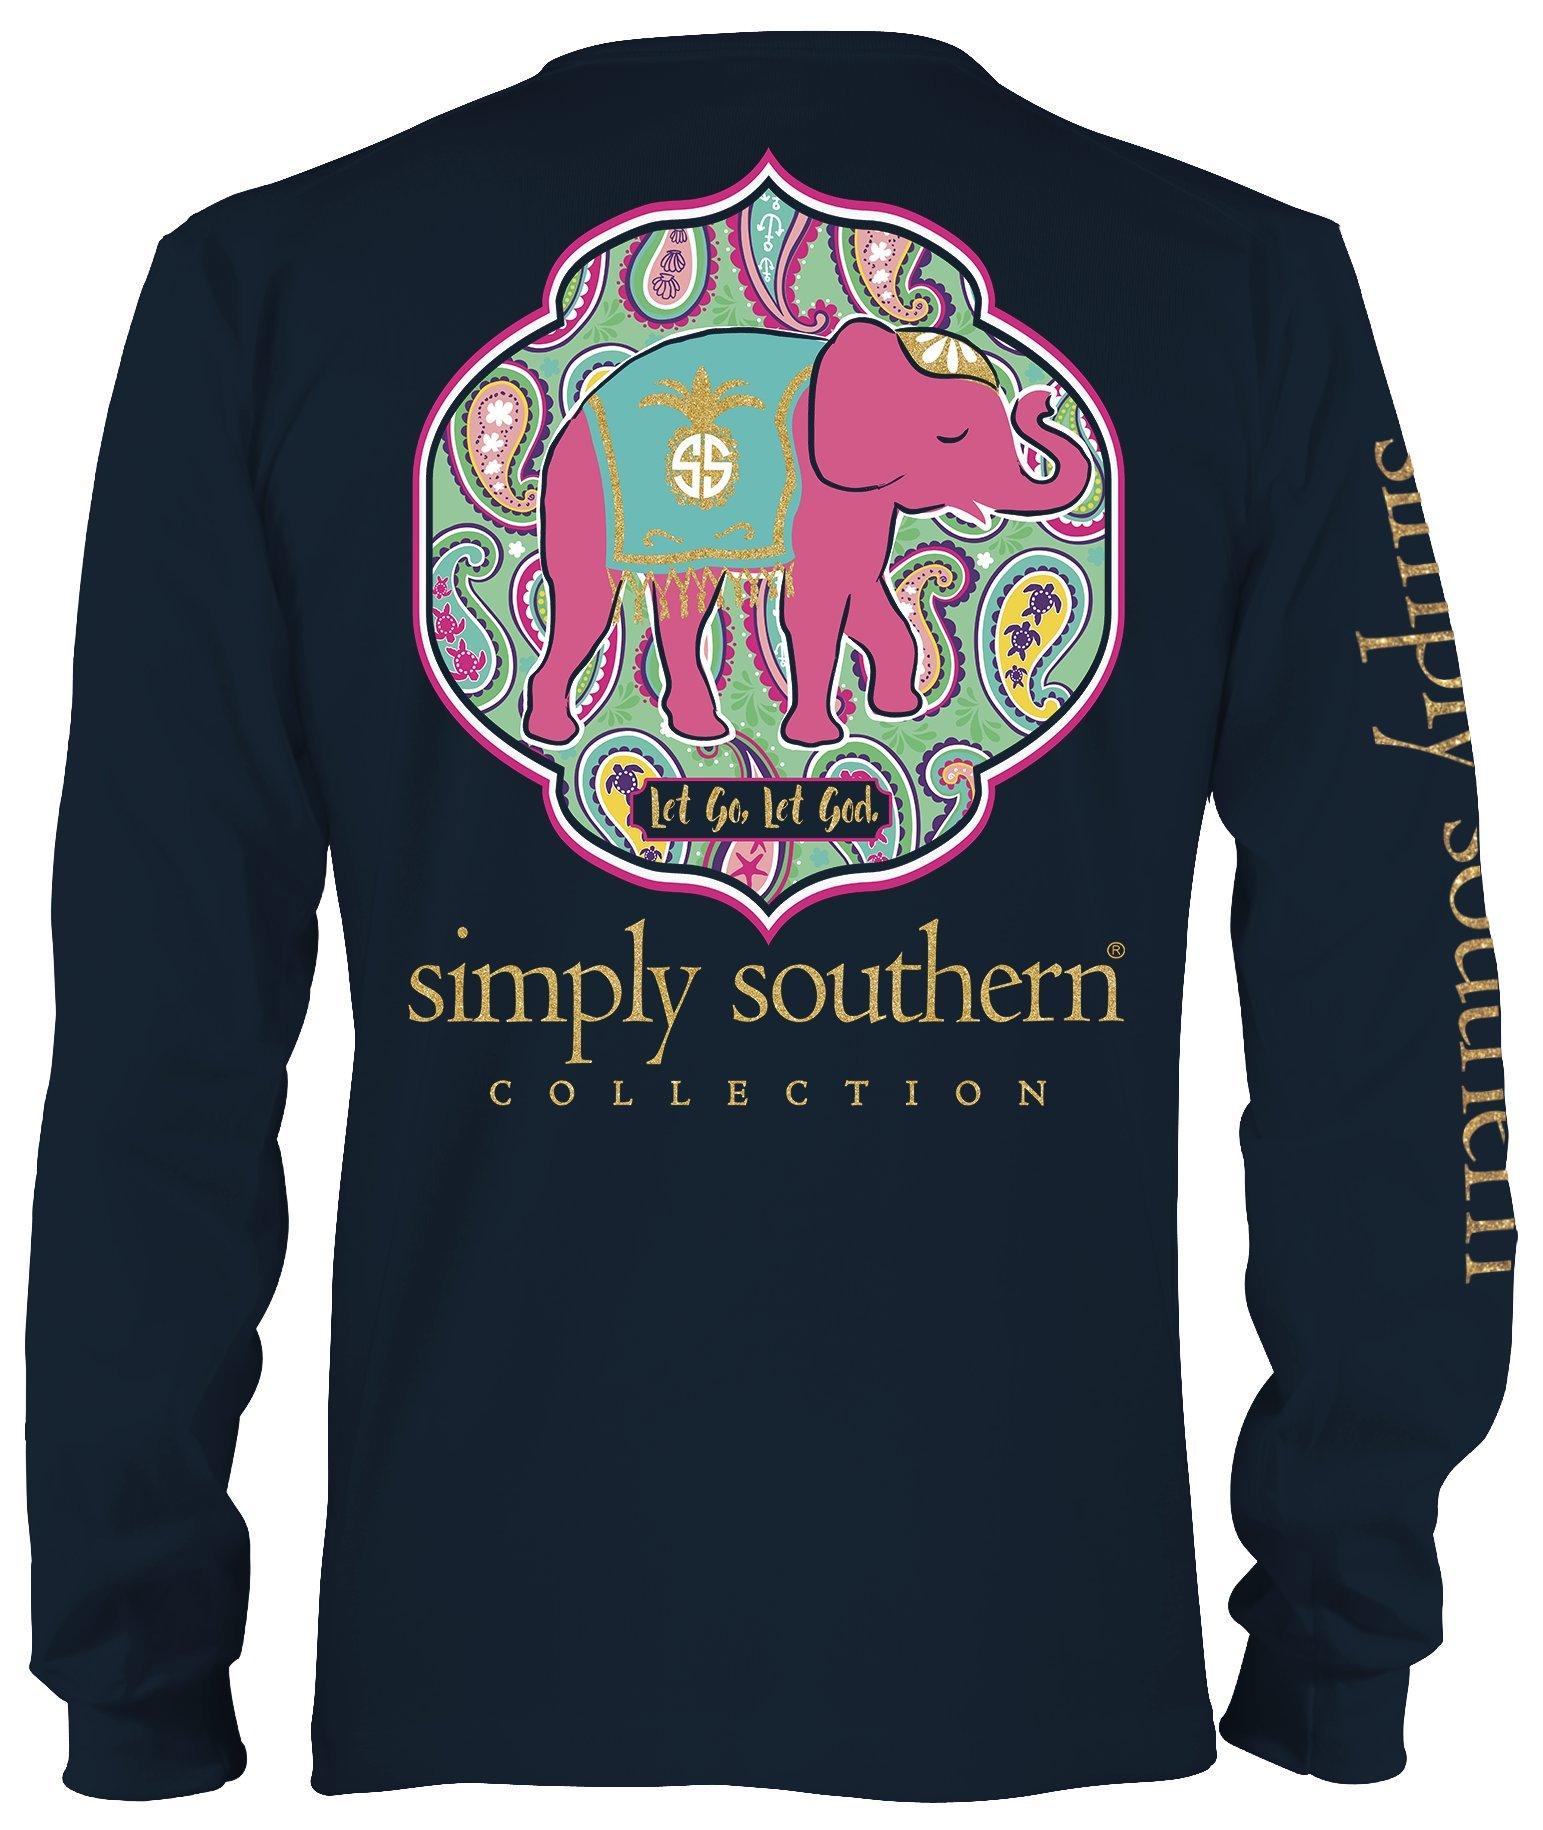 ffdf9ec4 Simply Southern Preppy Longsleeve Navy Shirt Let Go Let God - Medium Apparel